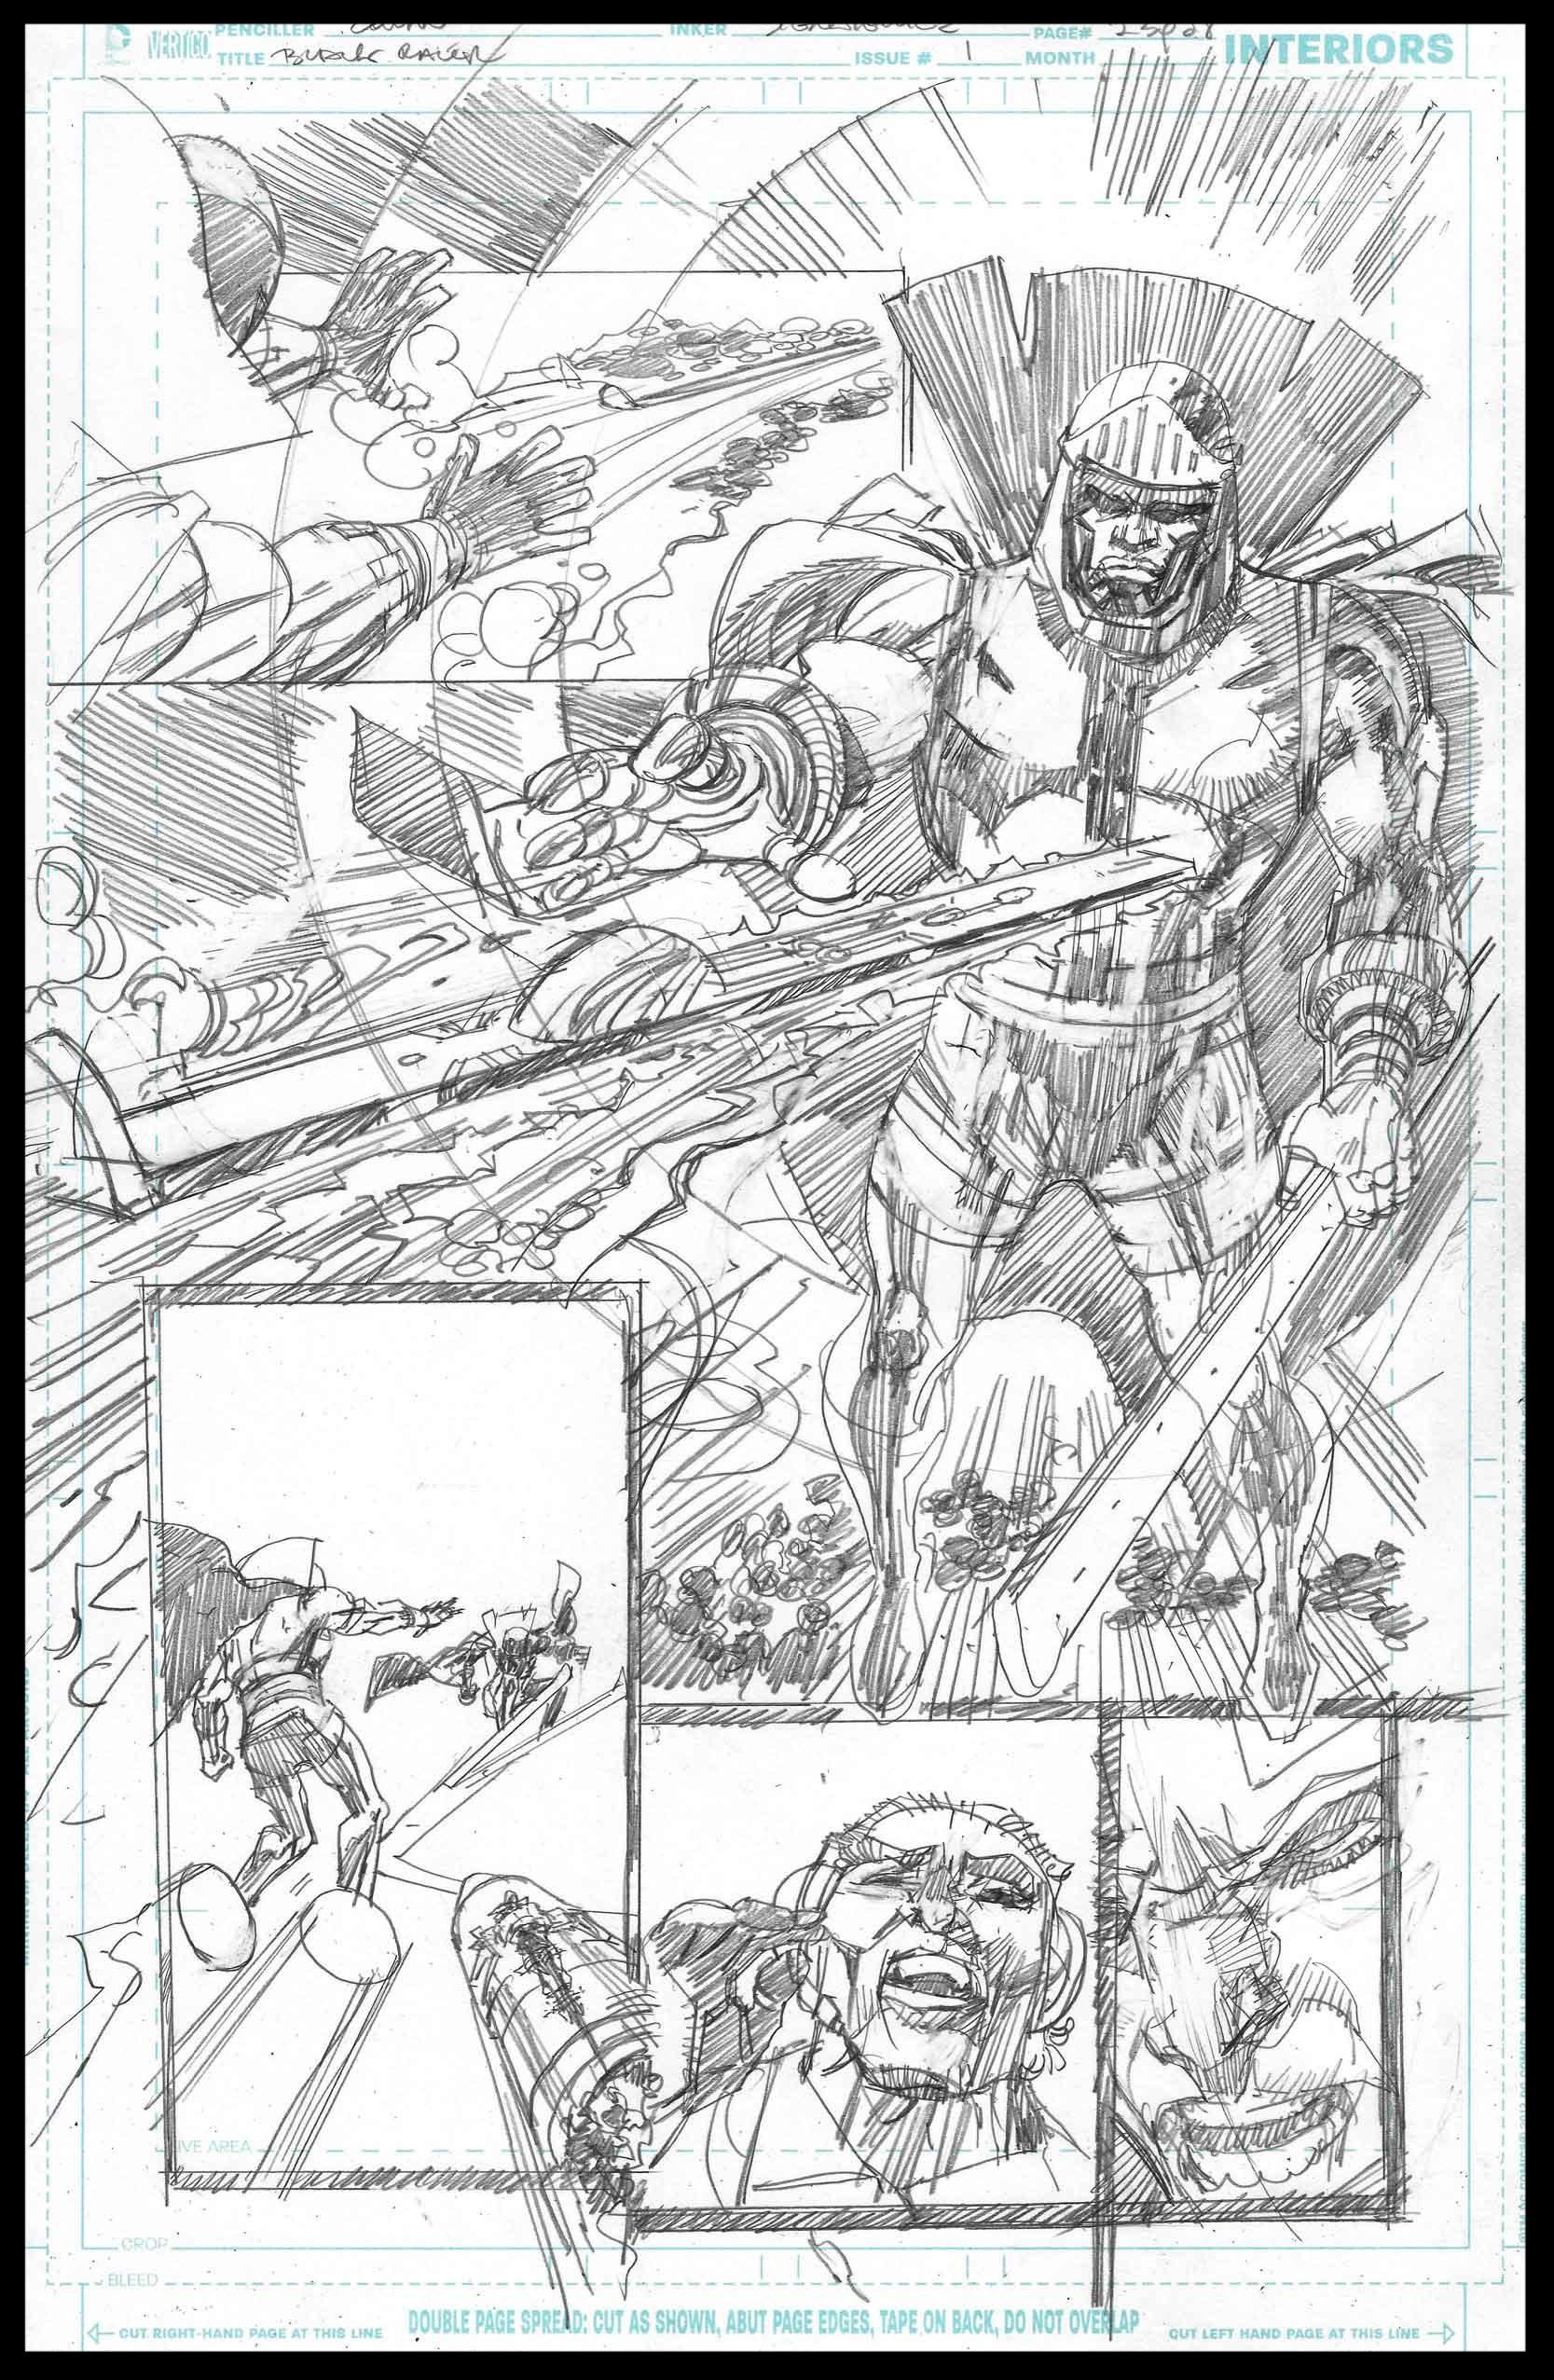 Black Racer #1 - Page 23 - Pencils